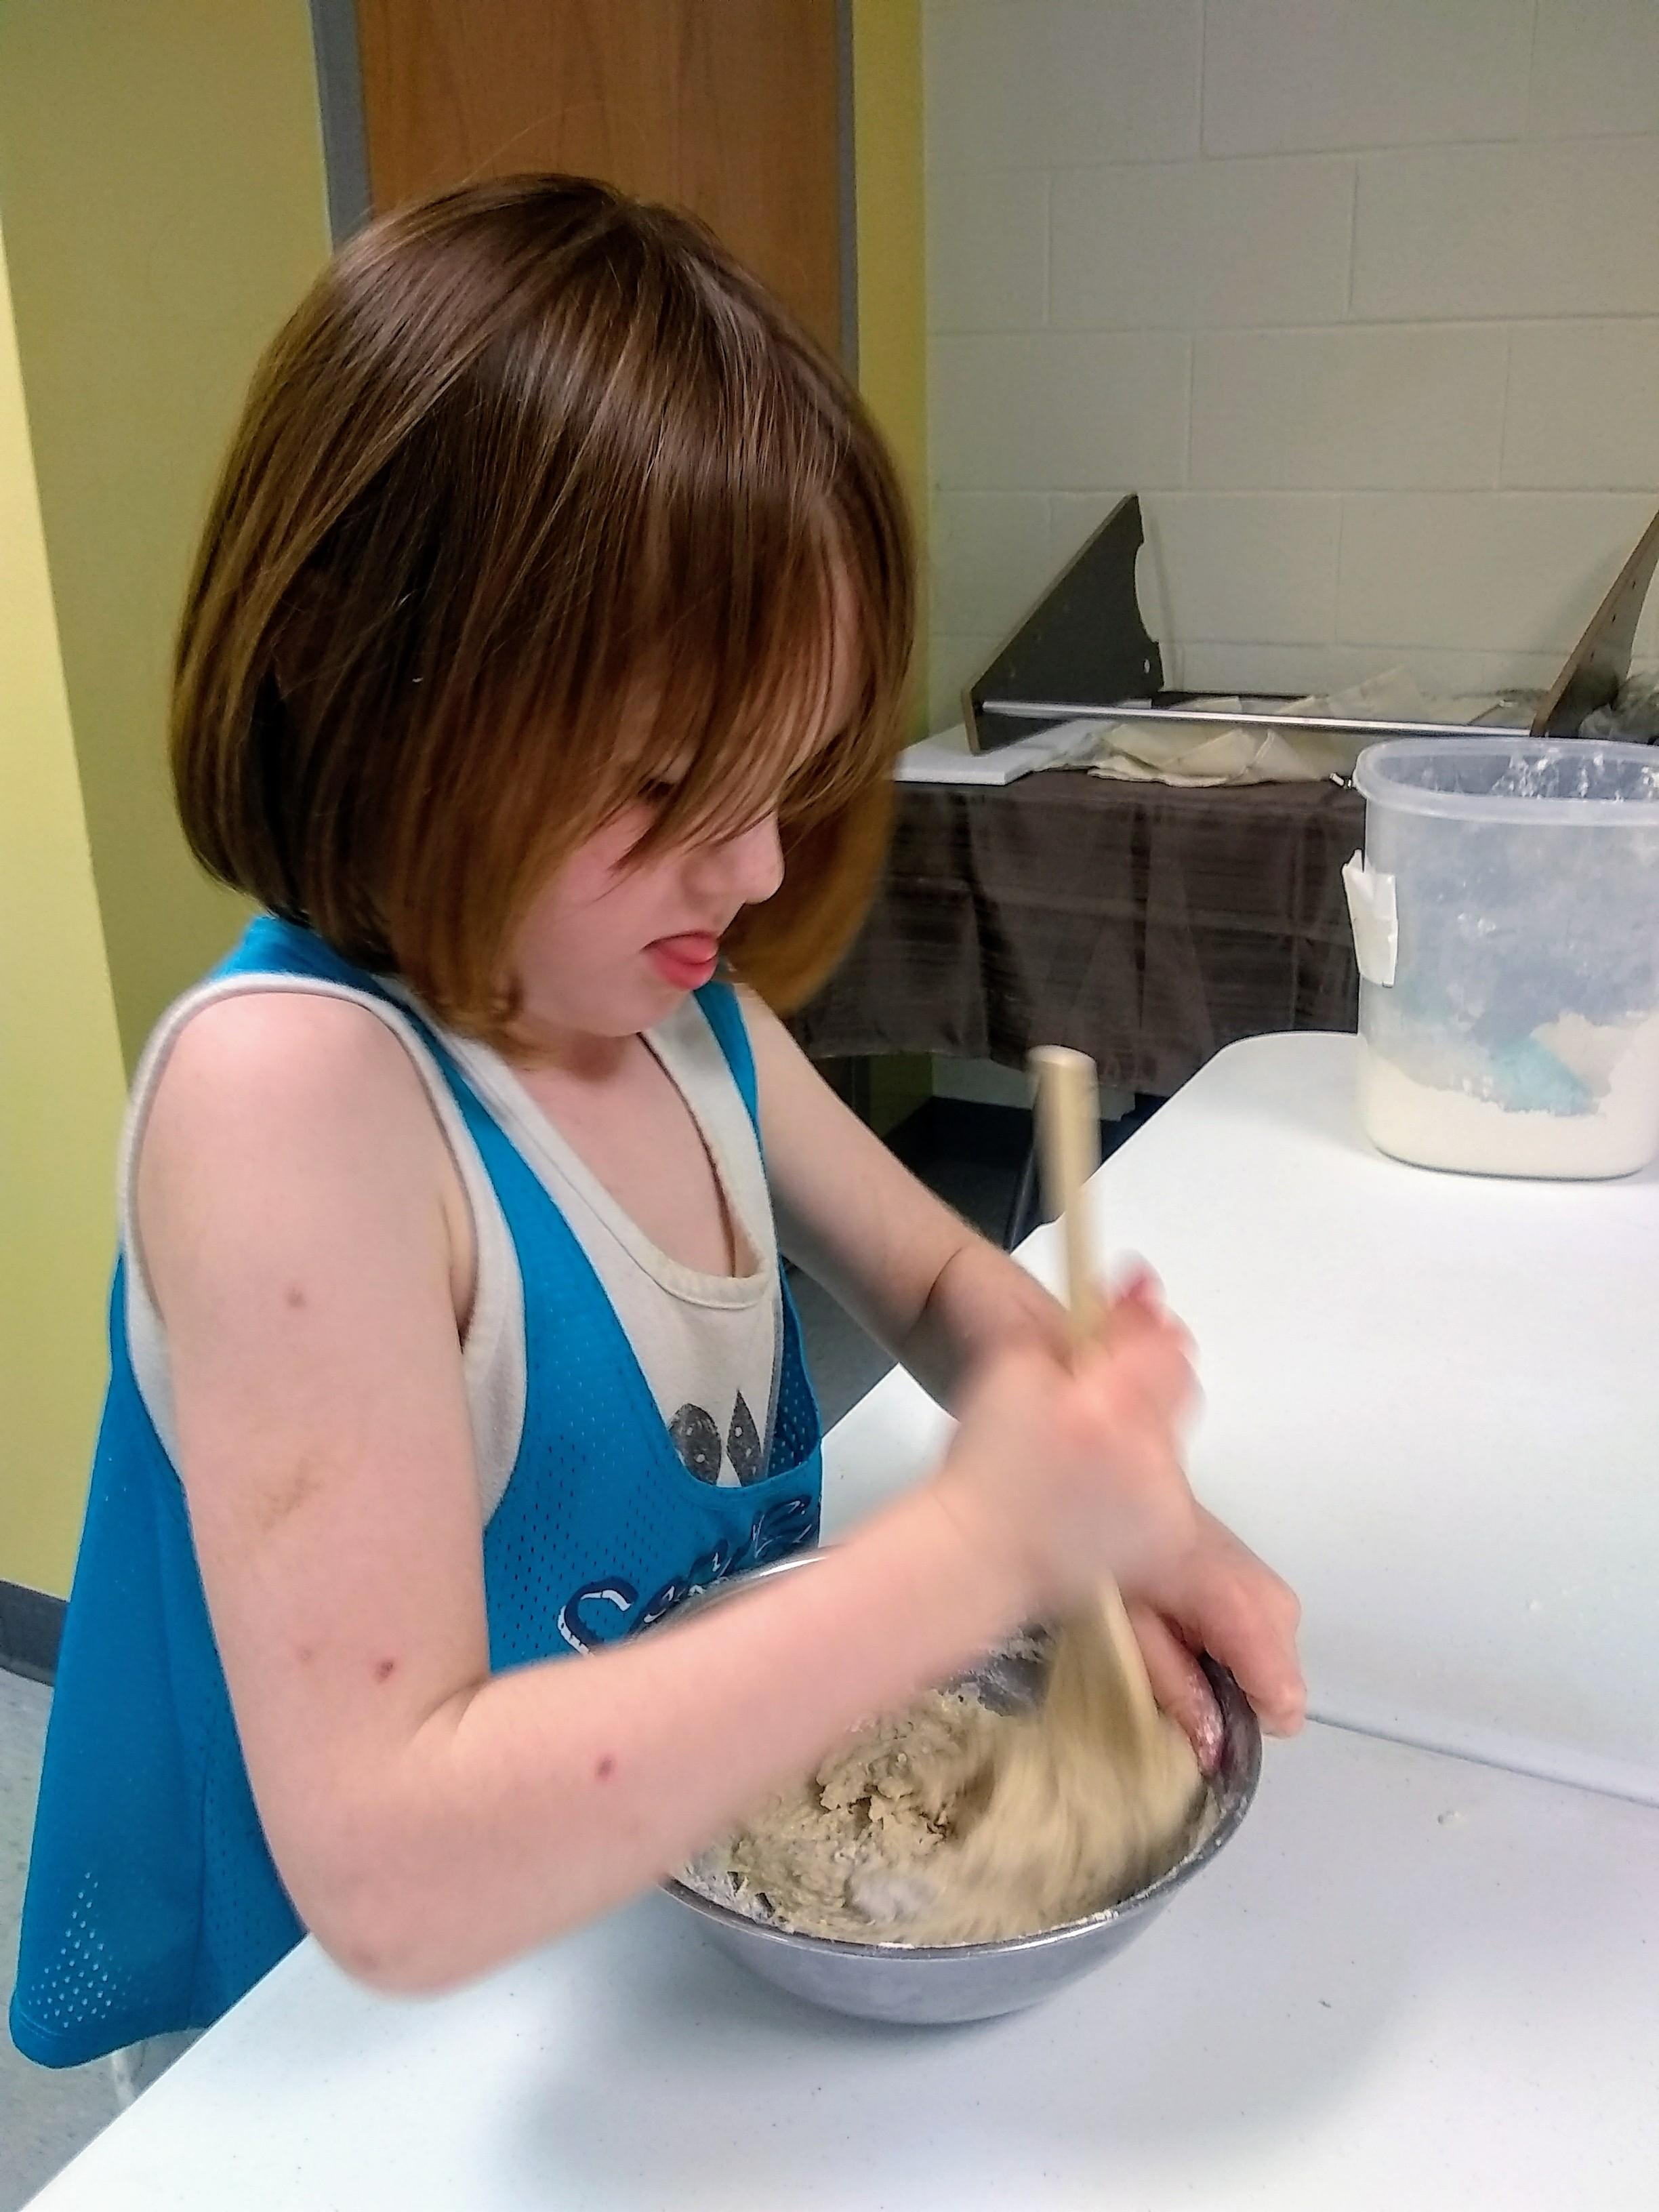 child mixing dough